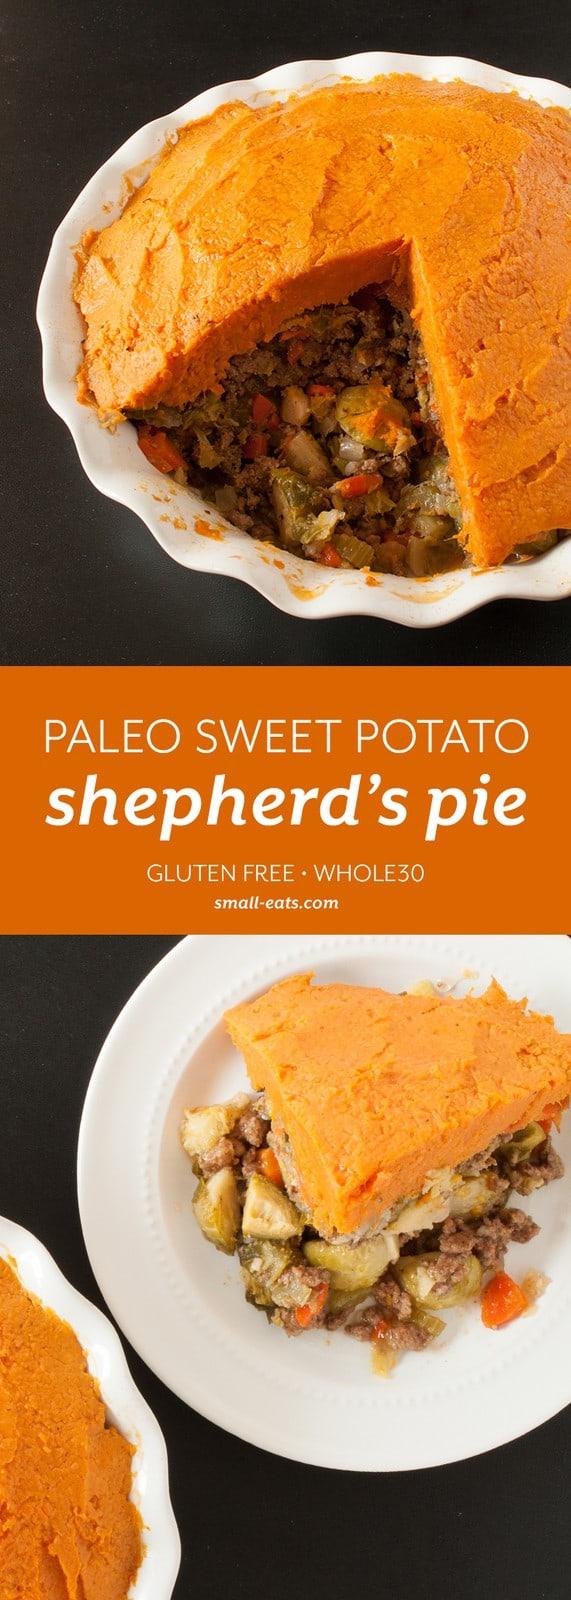 Enjoy a sweet potato, paleo twist on the classic Shepherd's pie. | Paleo Sweet Potato Shepherd's Pie from small-eats.com